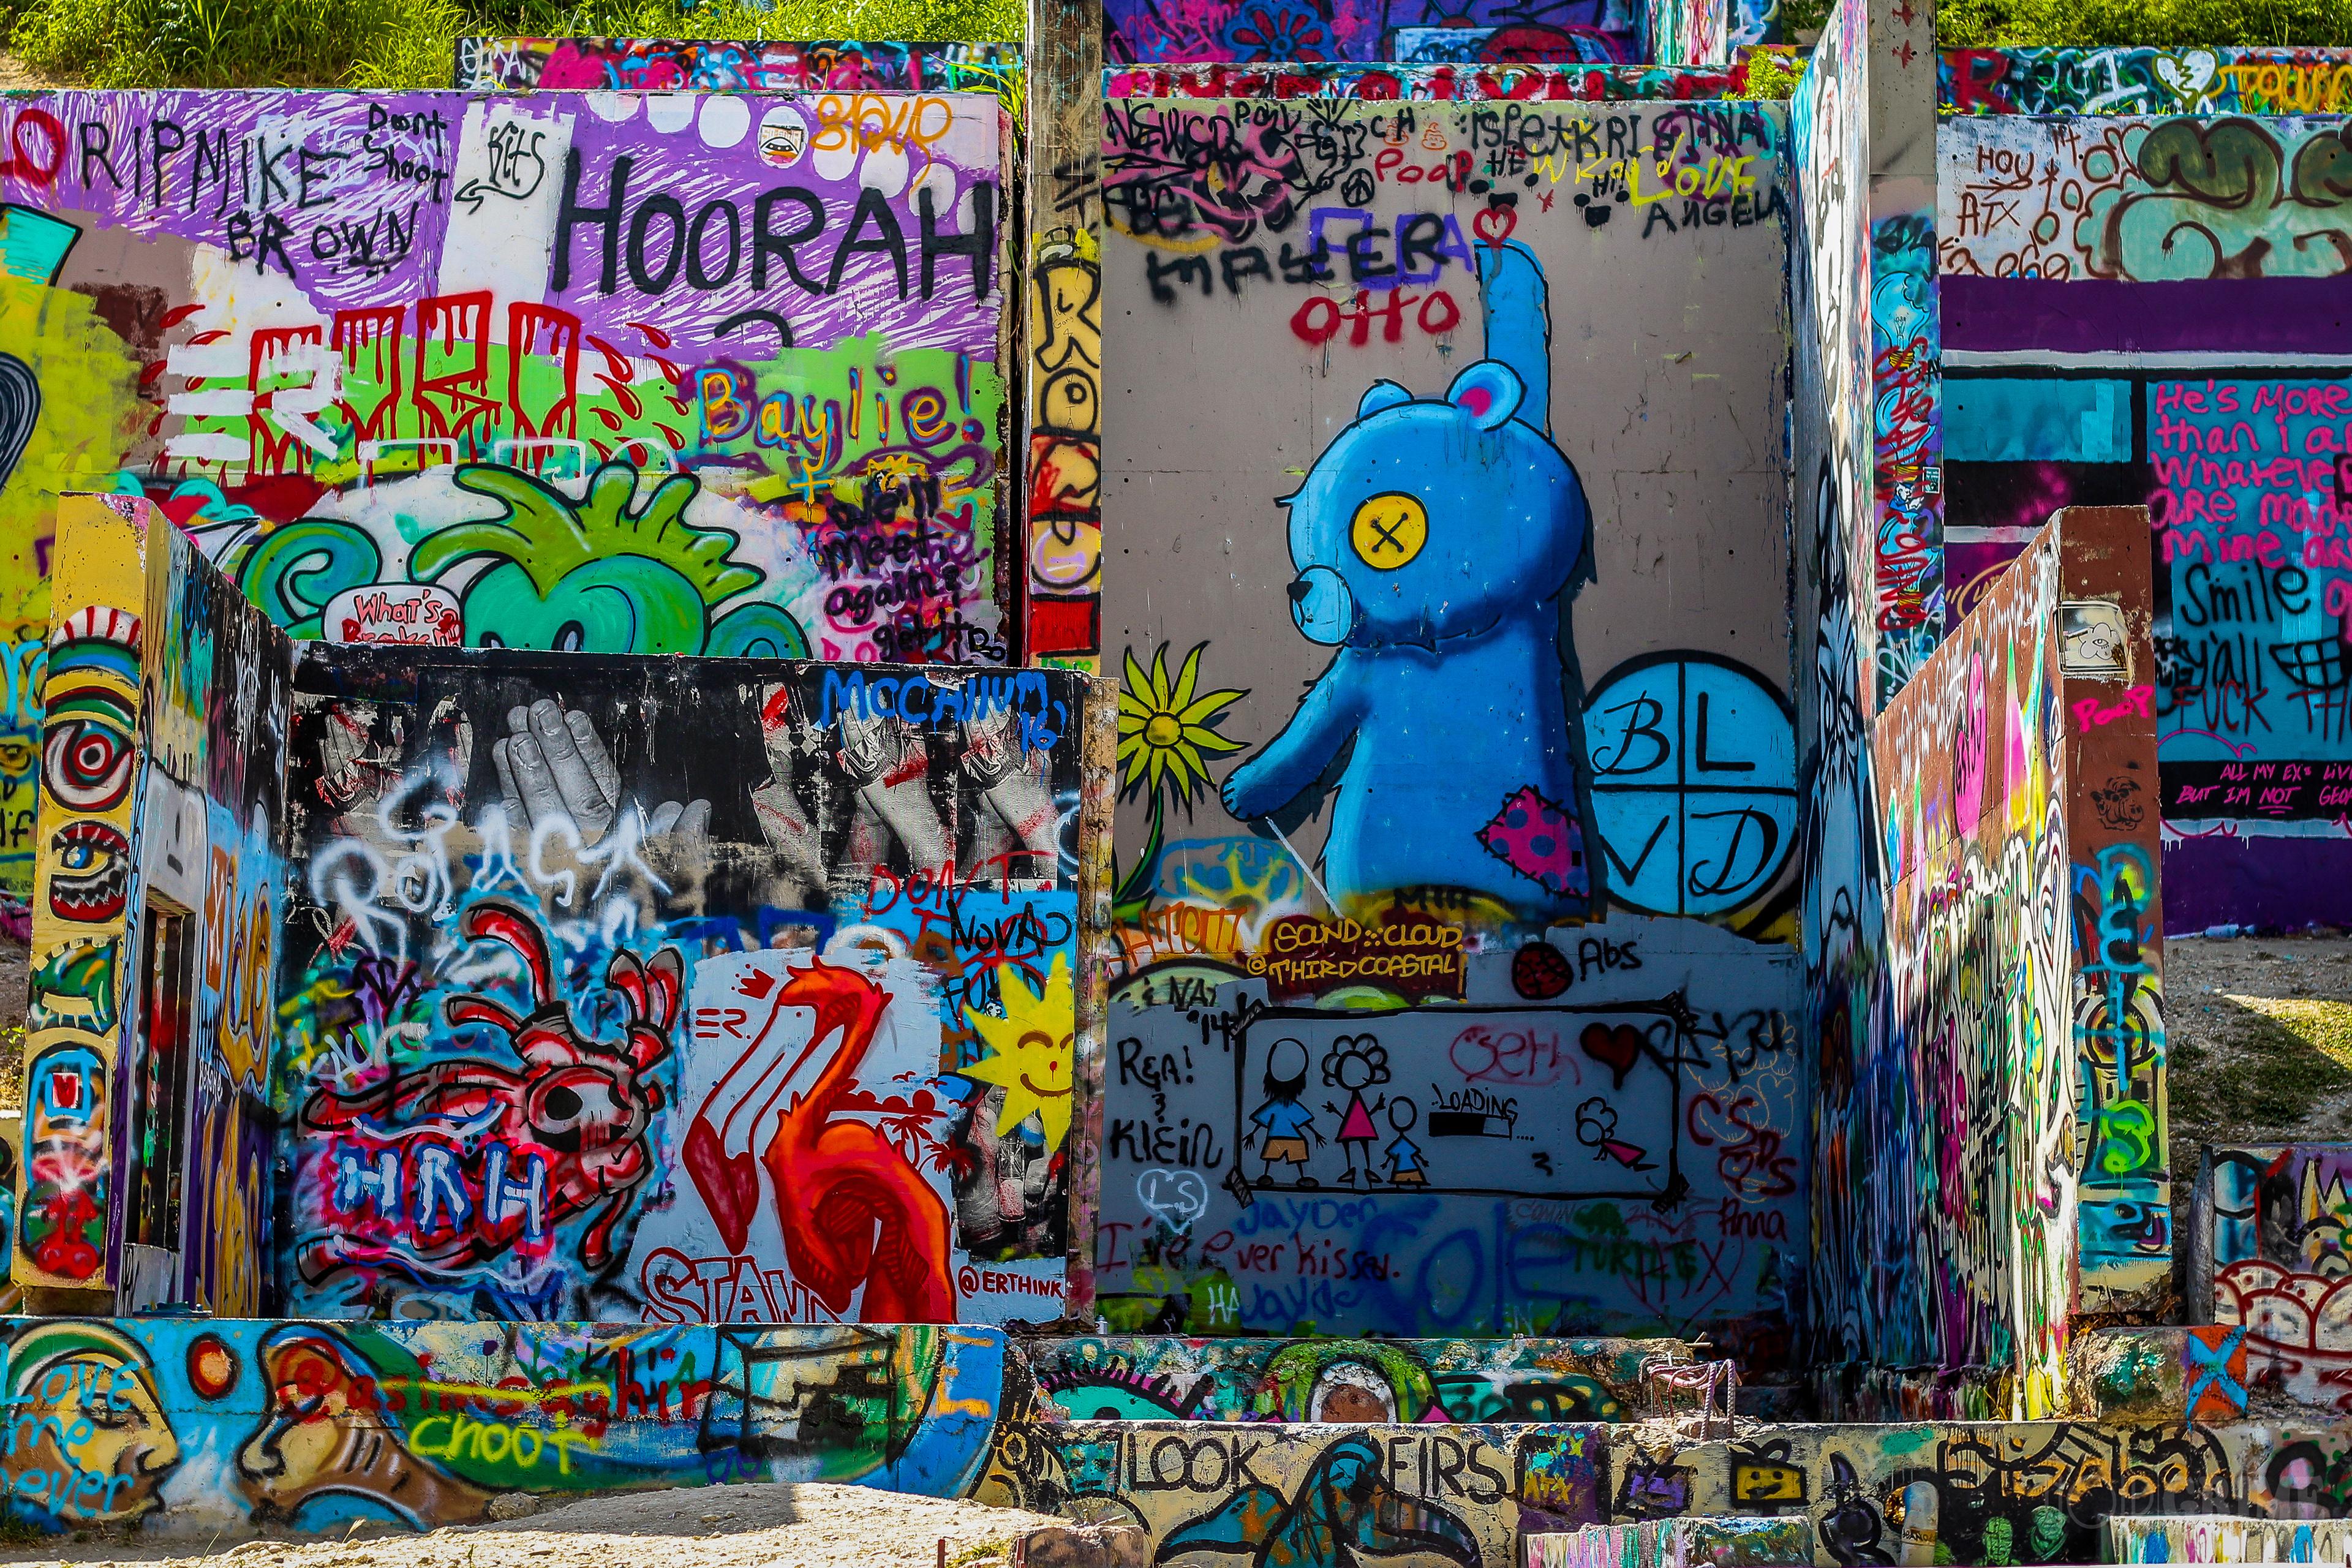 All photos were taken in austin texas at the graffiti wall